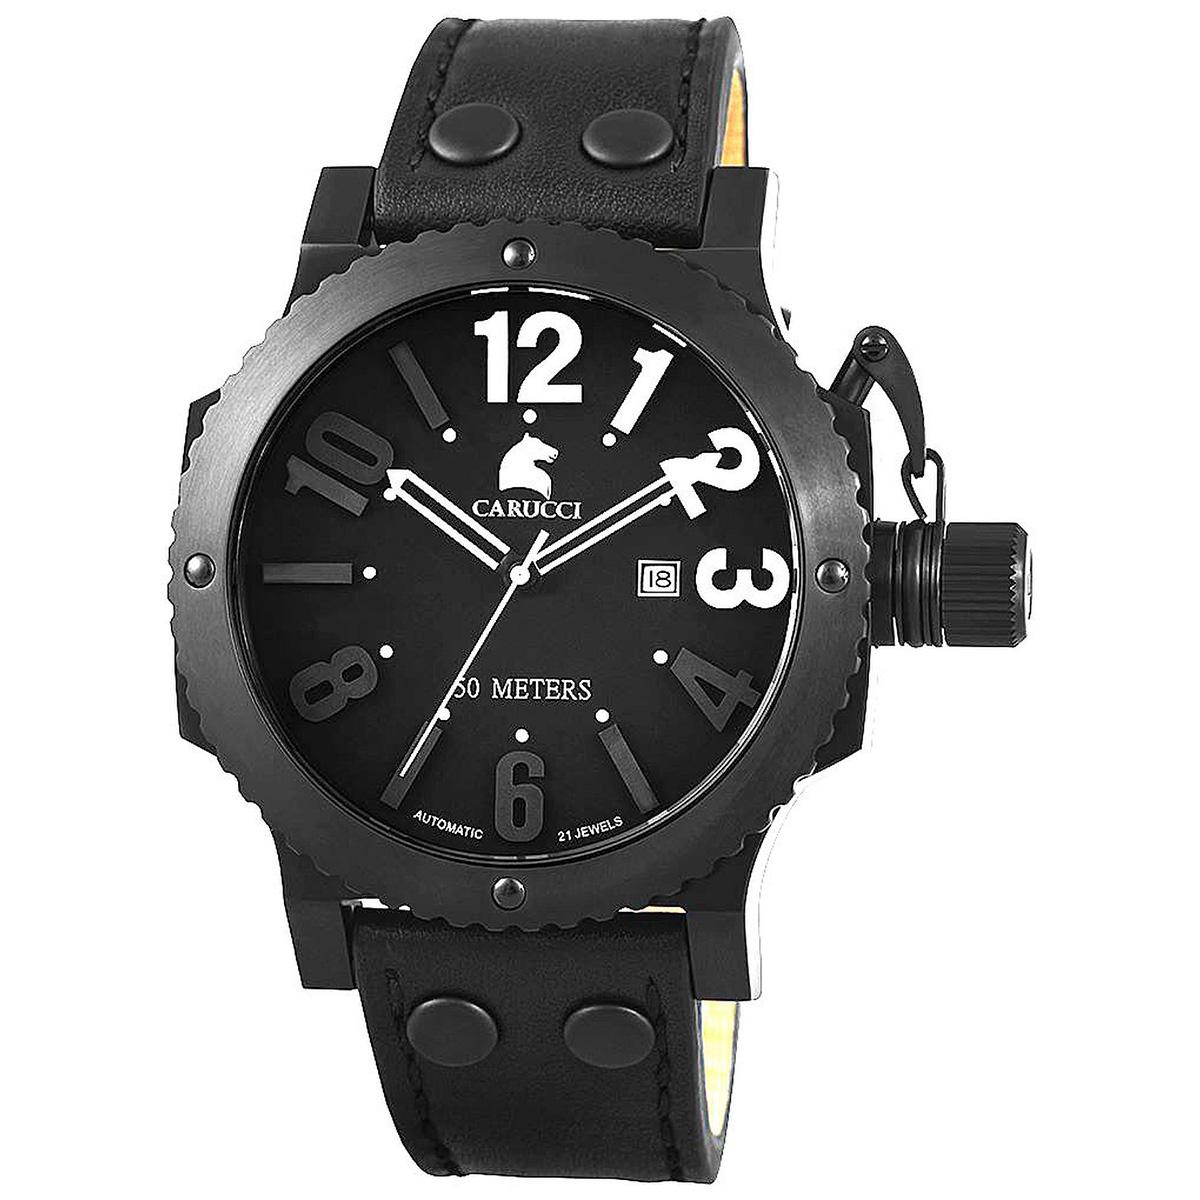 Carucci カルッチ 自動巻き 腕時計 メンズ [CA2211BK-WH] 並行輸入品 メーカー国際保証24ヵ月 純正ケース付き